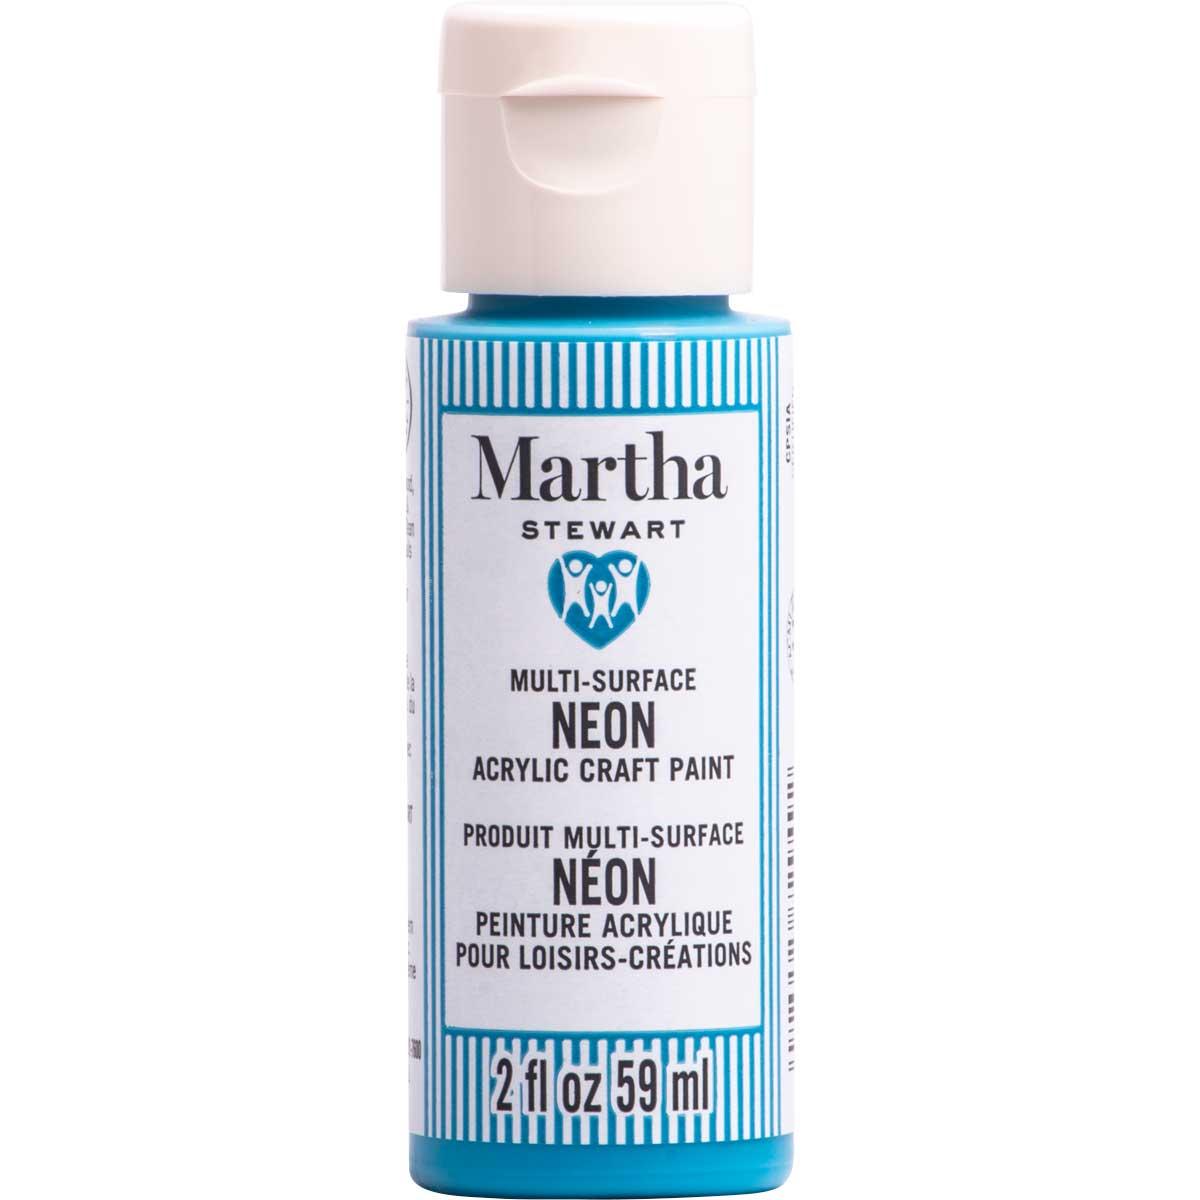 Martha Stewart® 2oz Multi-Surface Neon Acrylic Craft Paint - Blue Bird